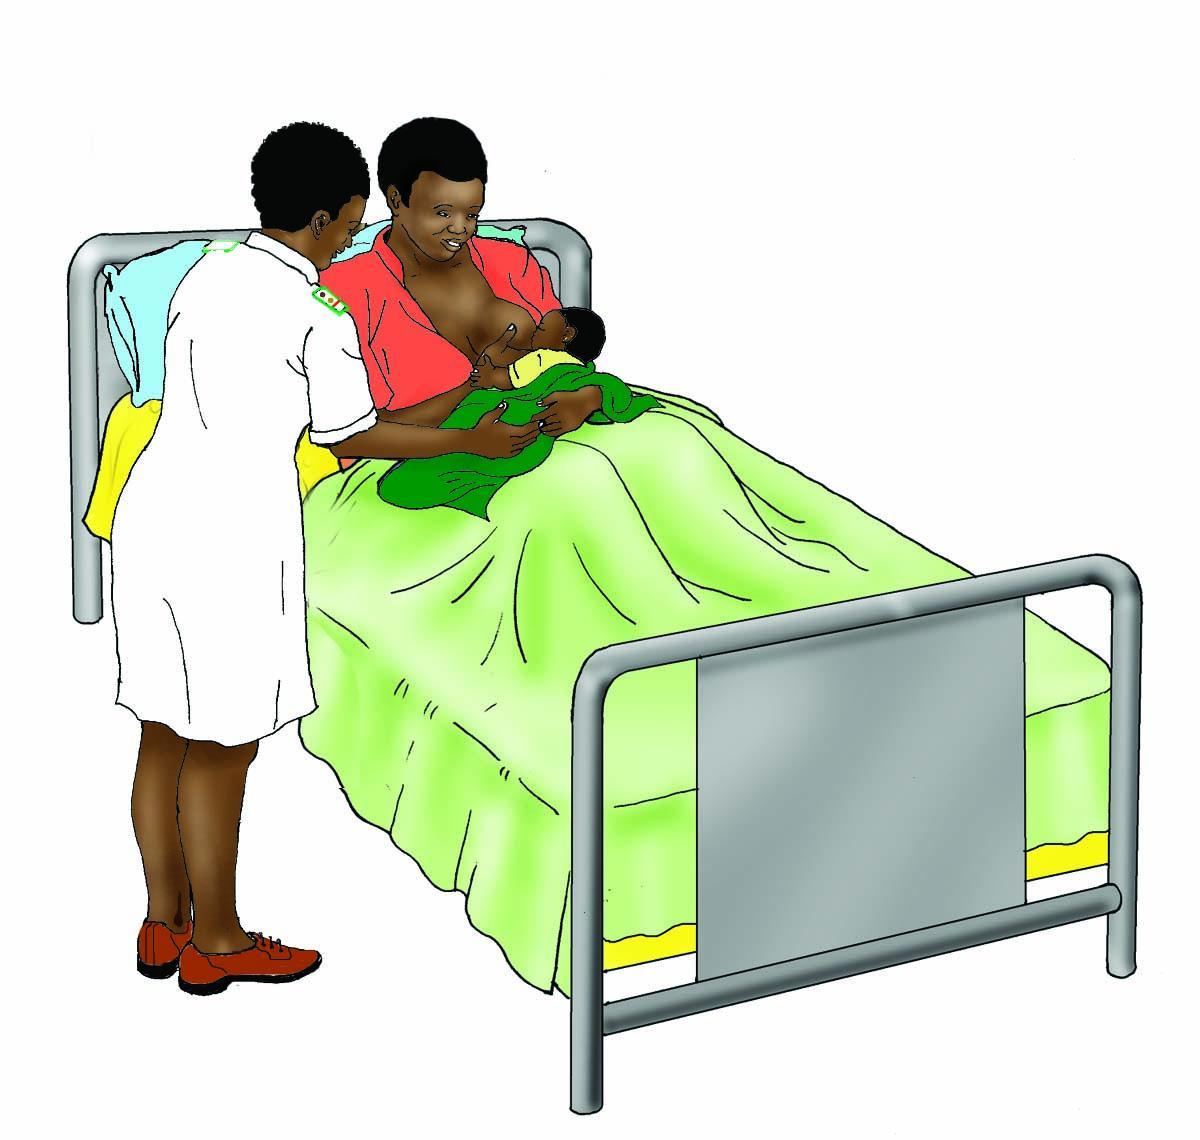 Breastfeeding - Early initiation of breastfeeding - 00 - Zimbabwe